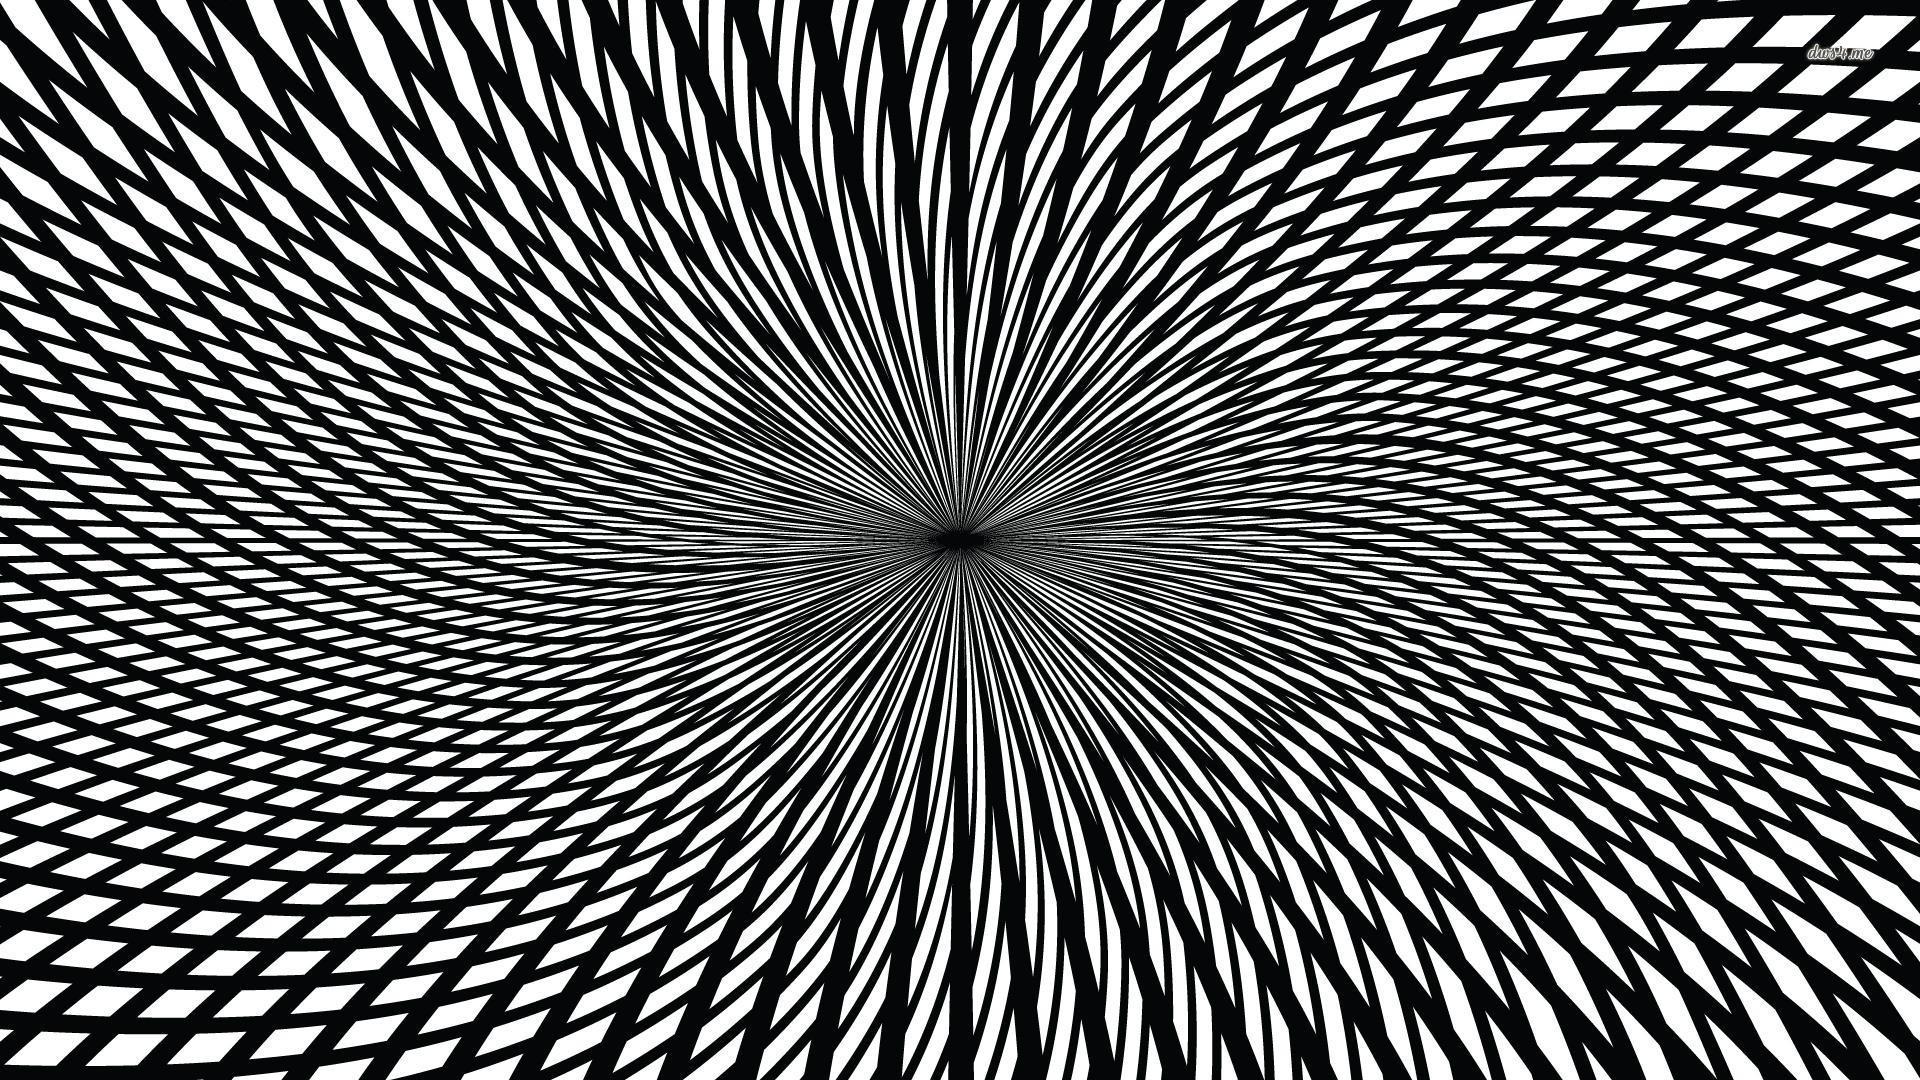 Optical illusion Abstract HD desktop wallpaper, Illusion wallpaper –  Abstract no.